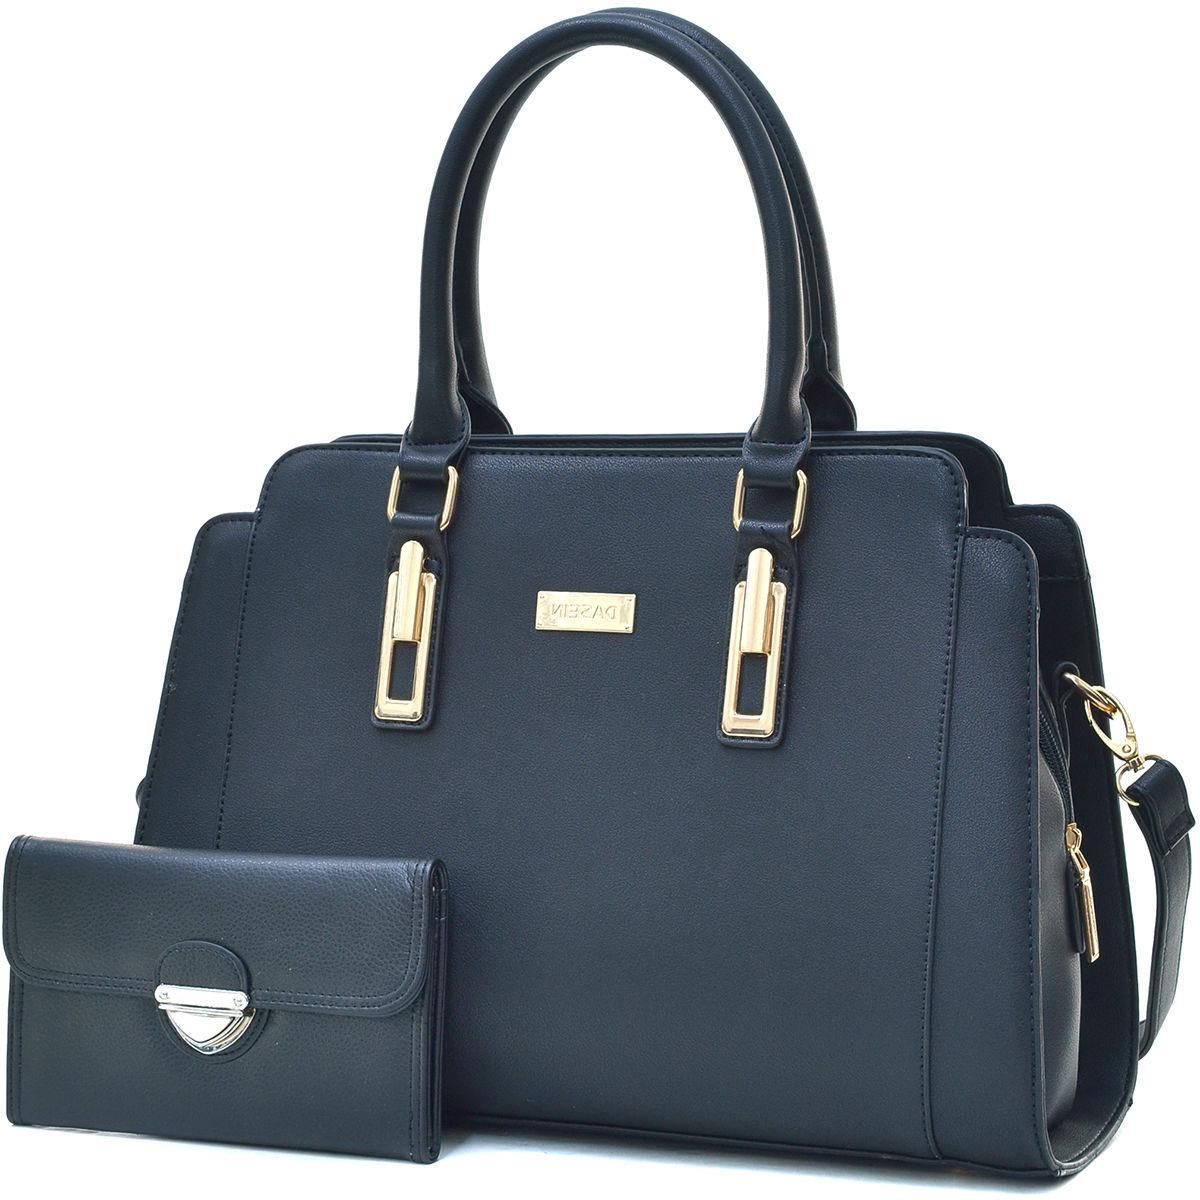 New Dasein Womens Handbags Faux Leather Satchel Tote Bag Lar